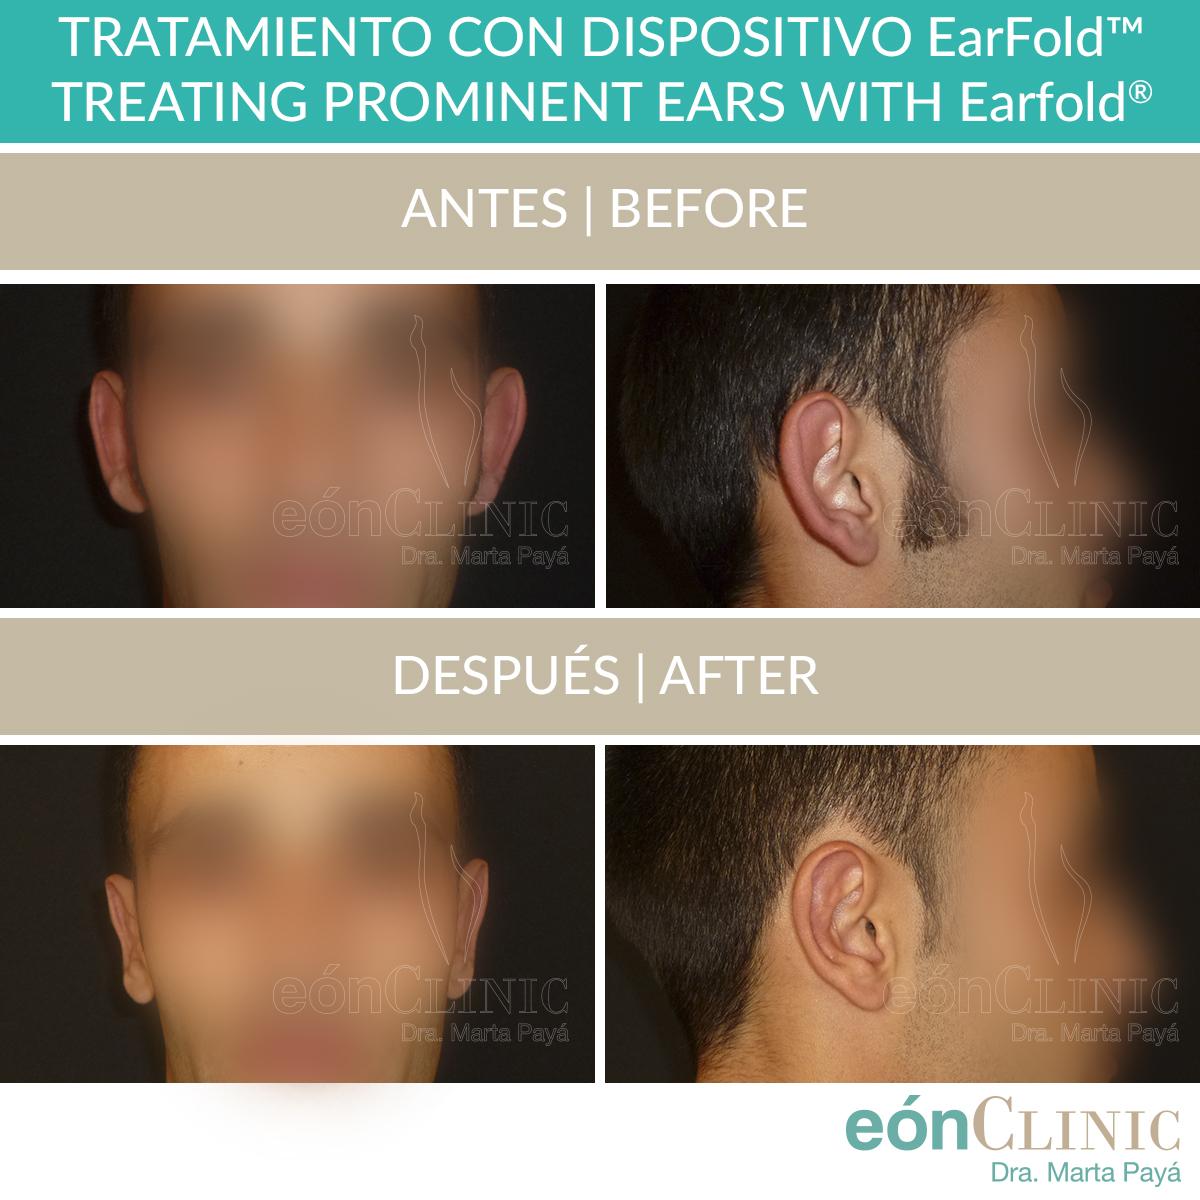 EonClinic